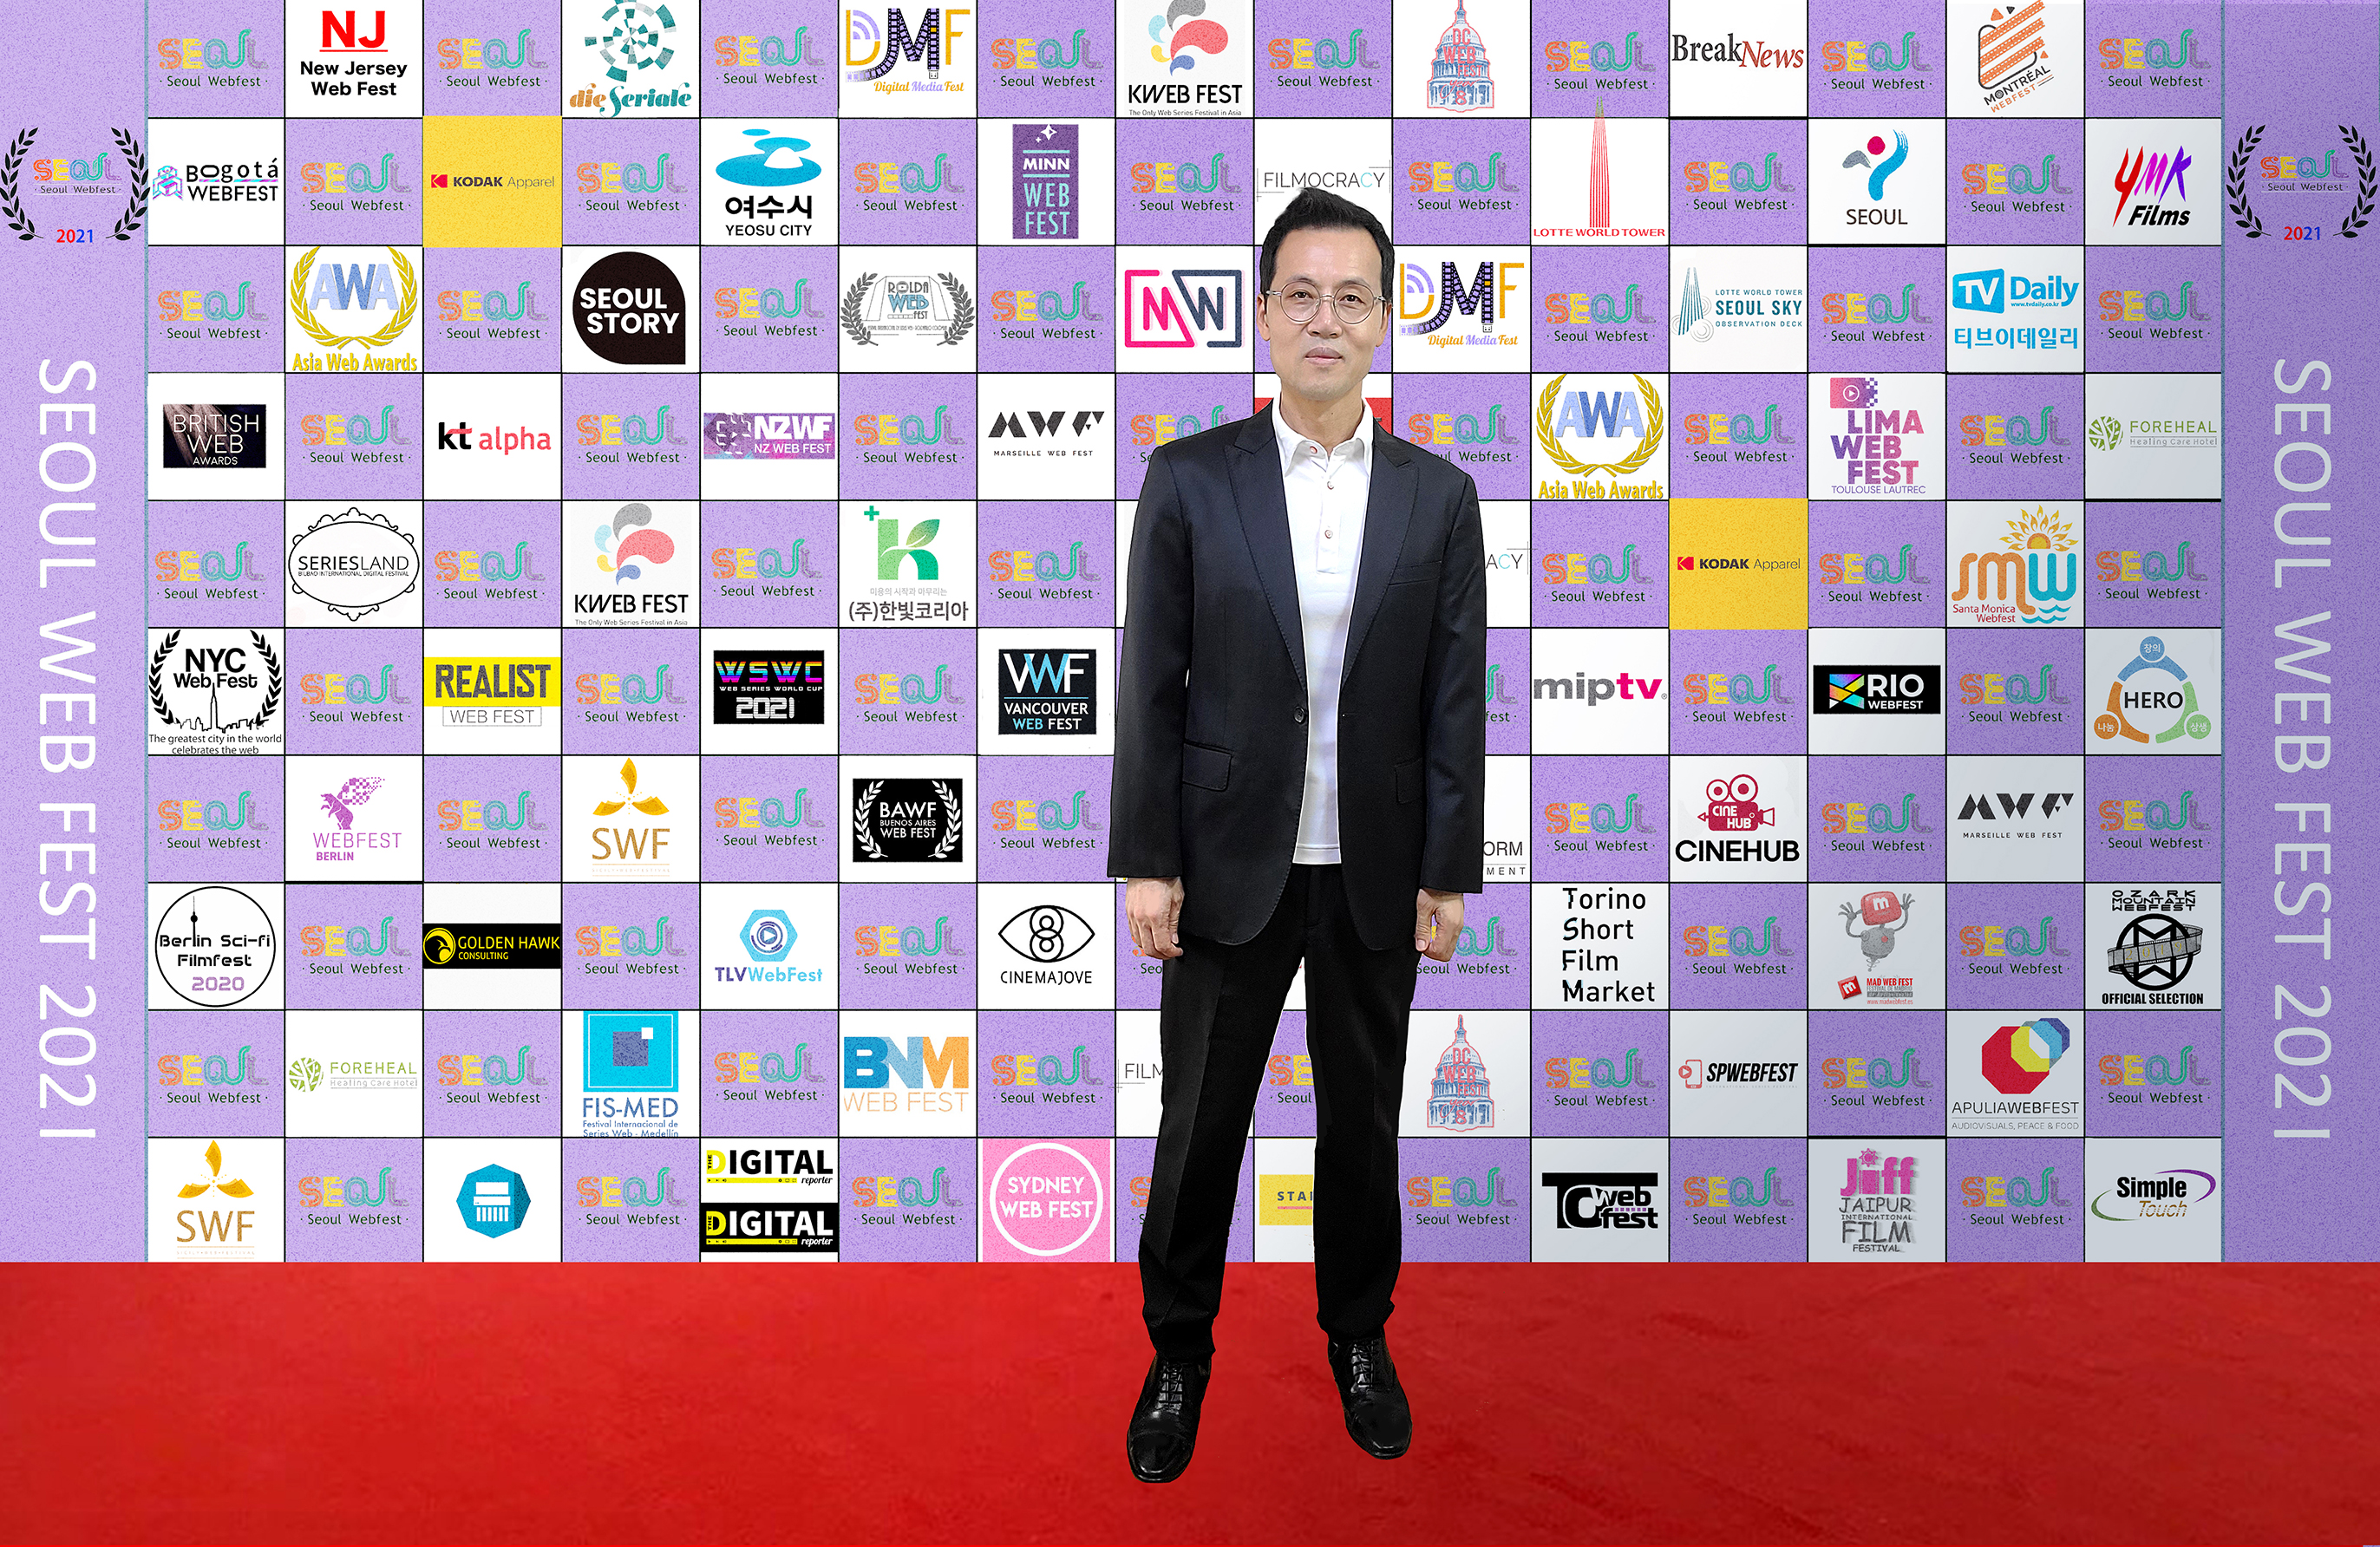 Young Man Kang - KWEB FEST 2021